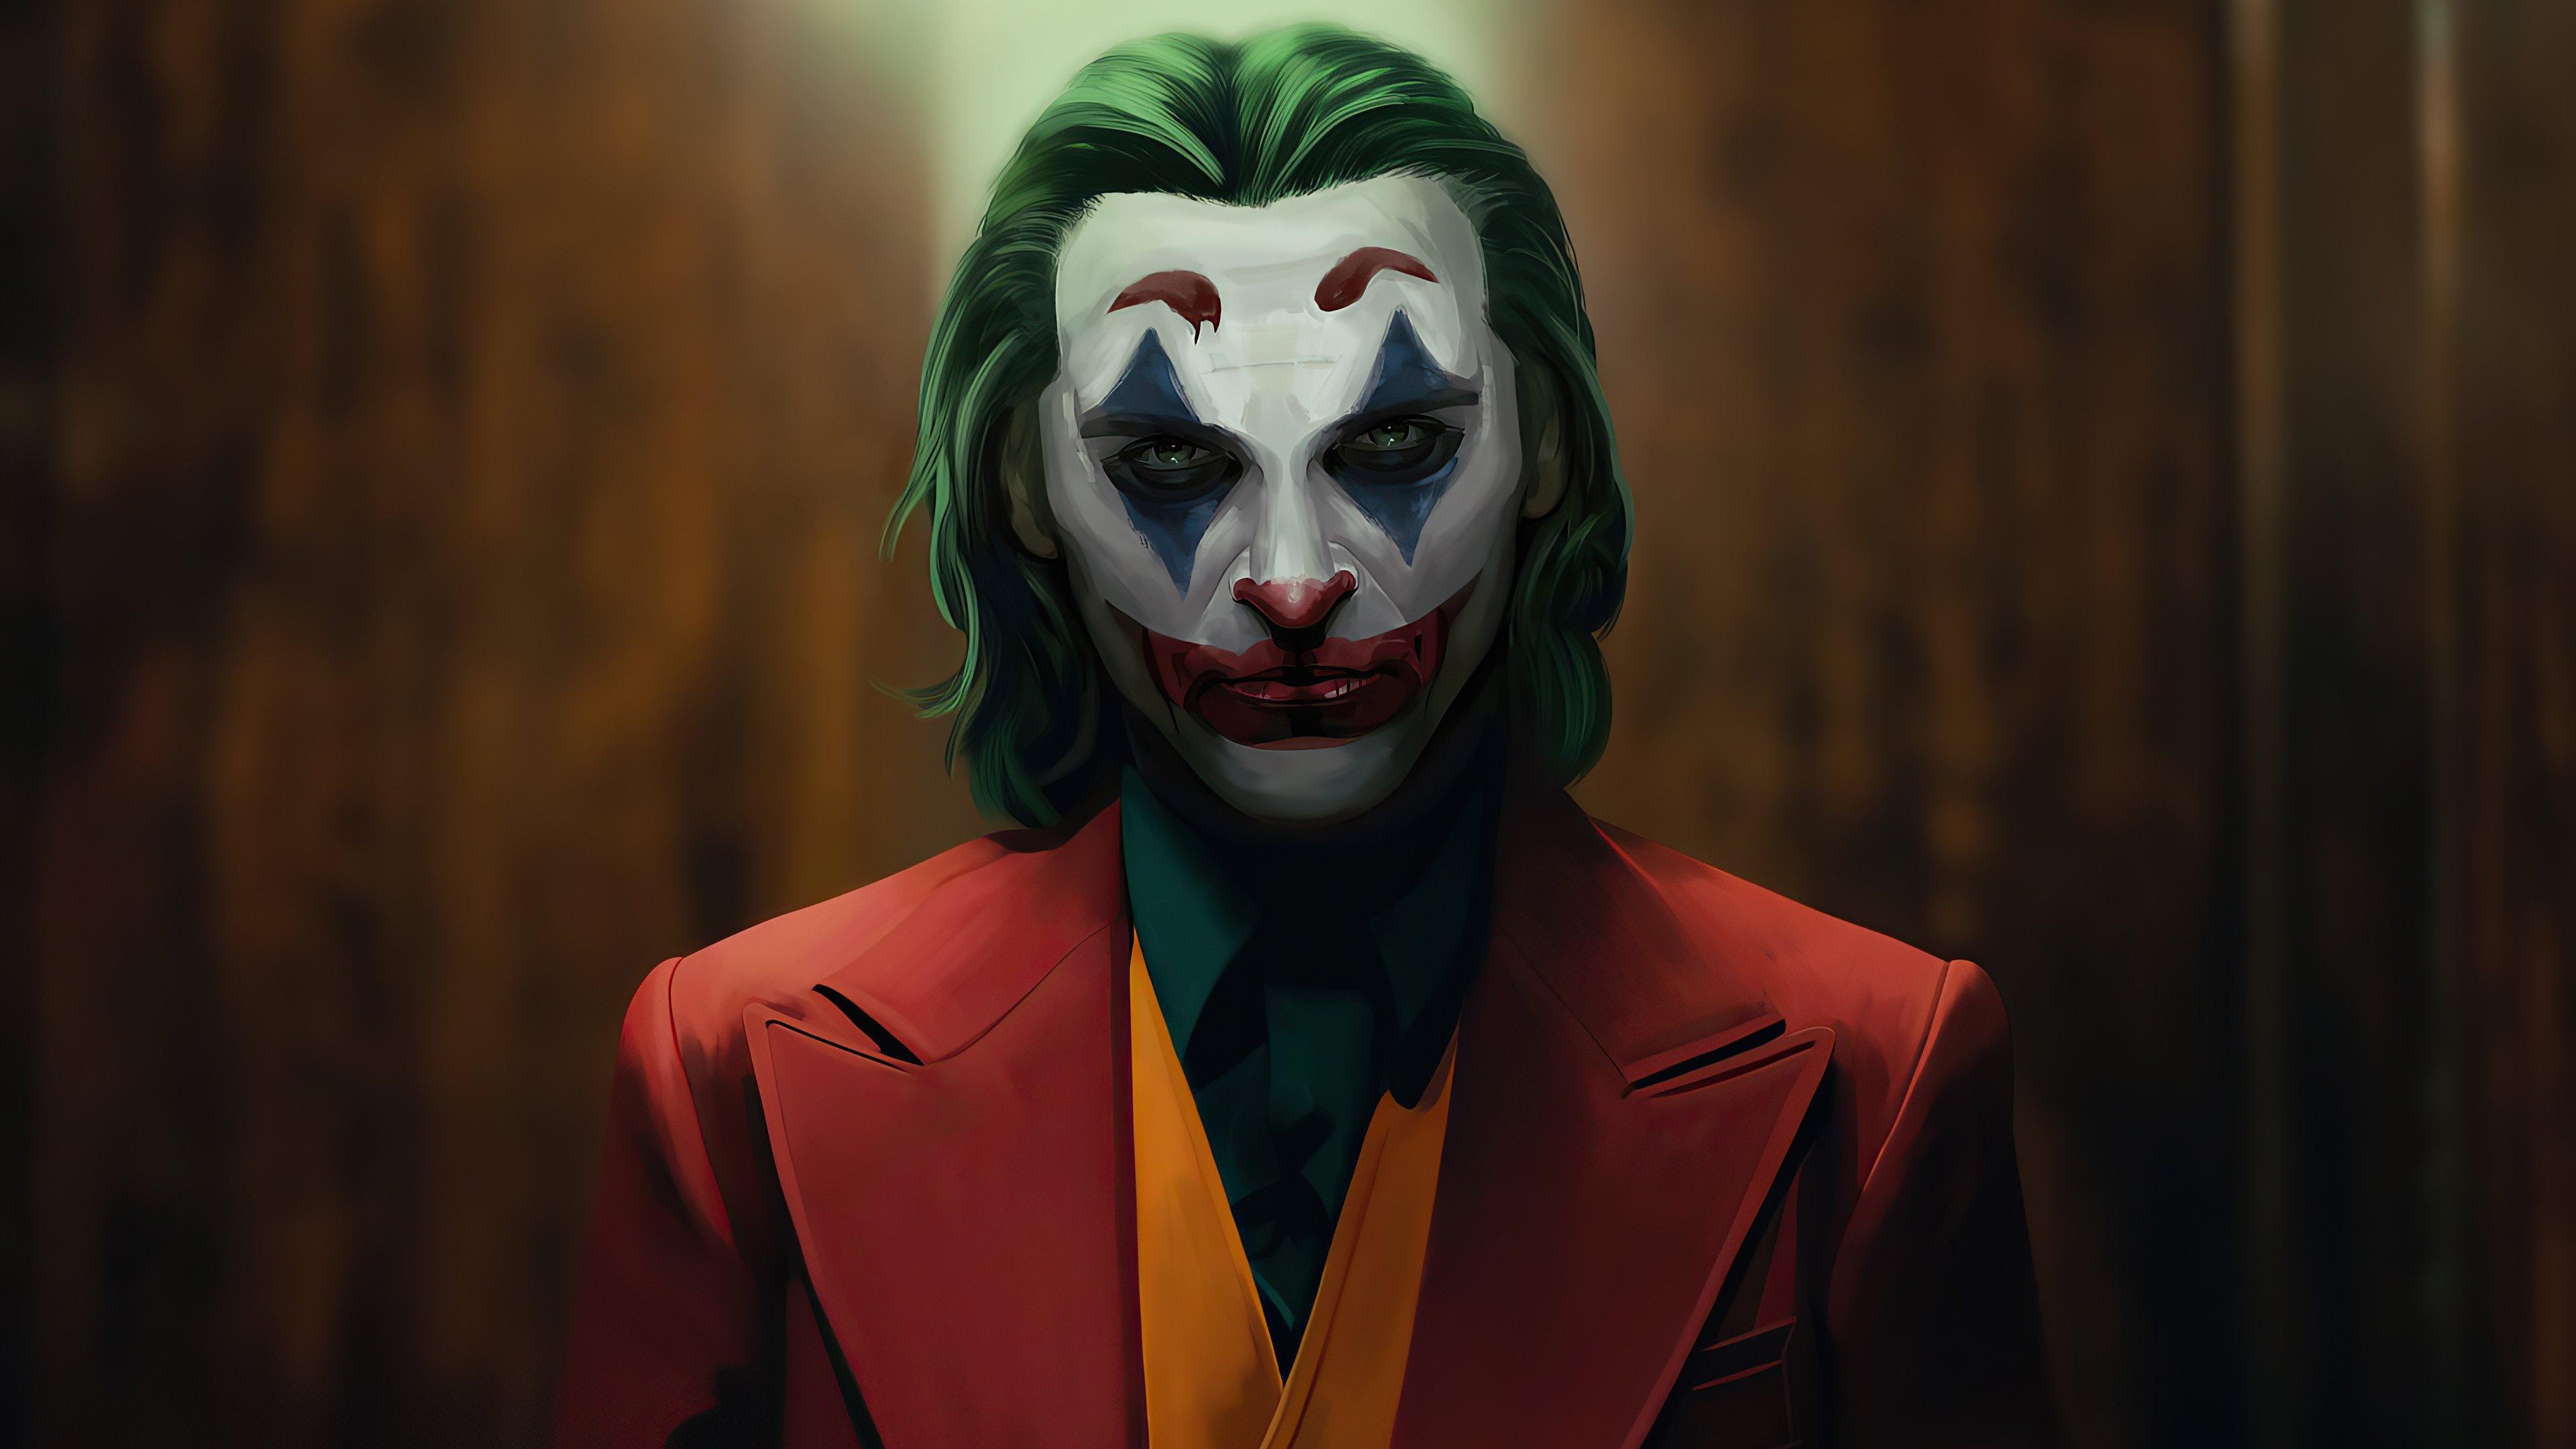 Wallpaper Joker Sketch Artwork